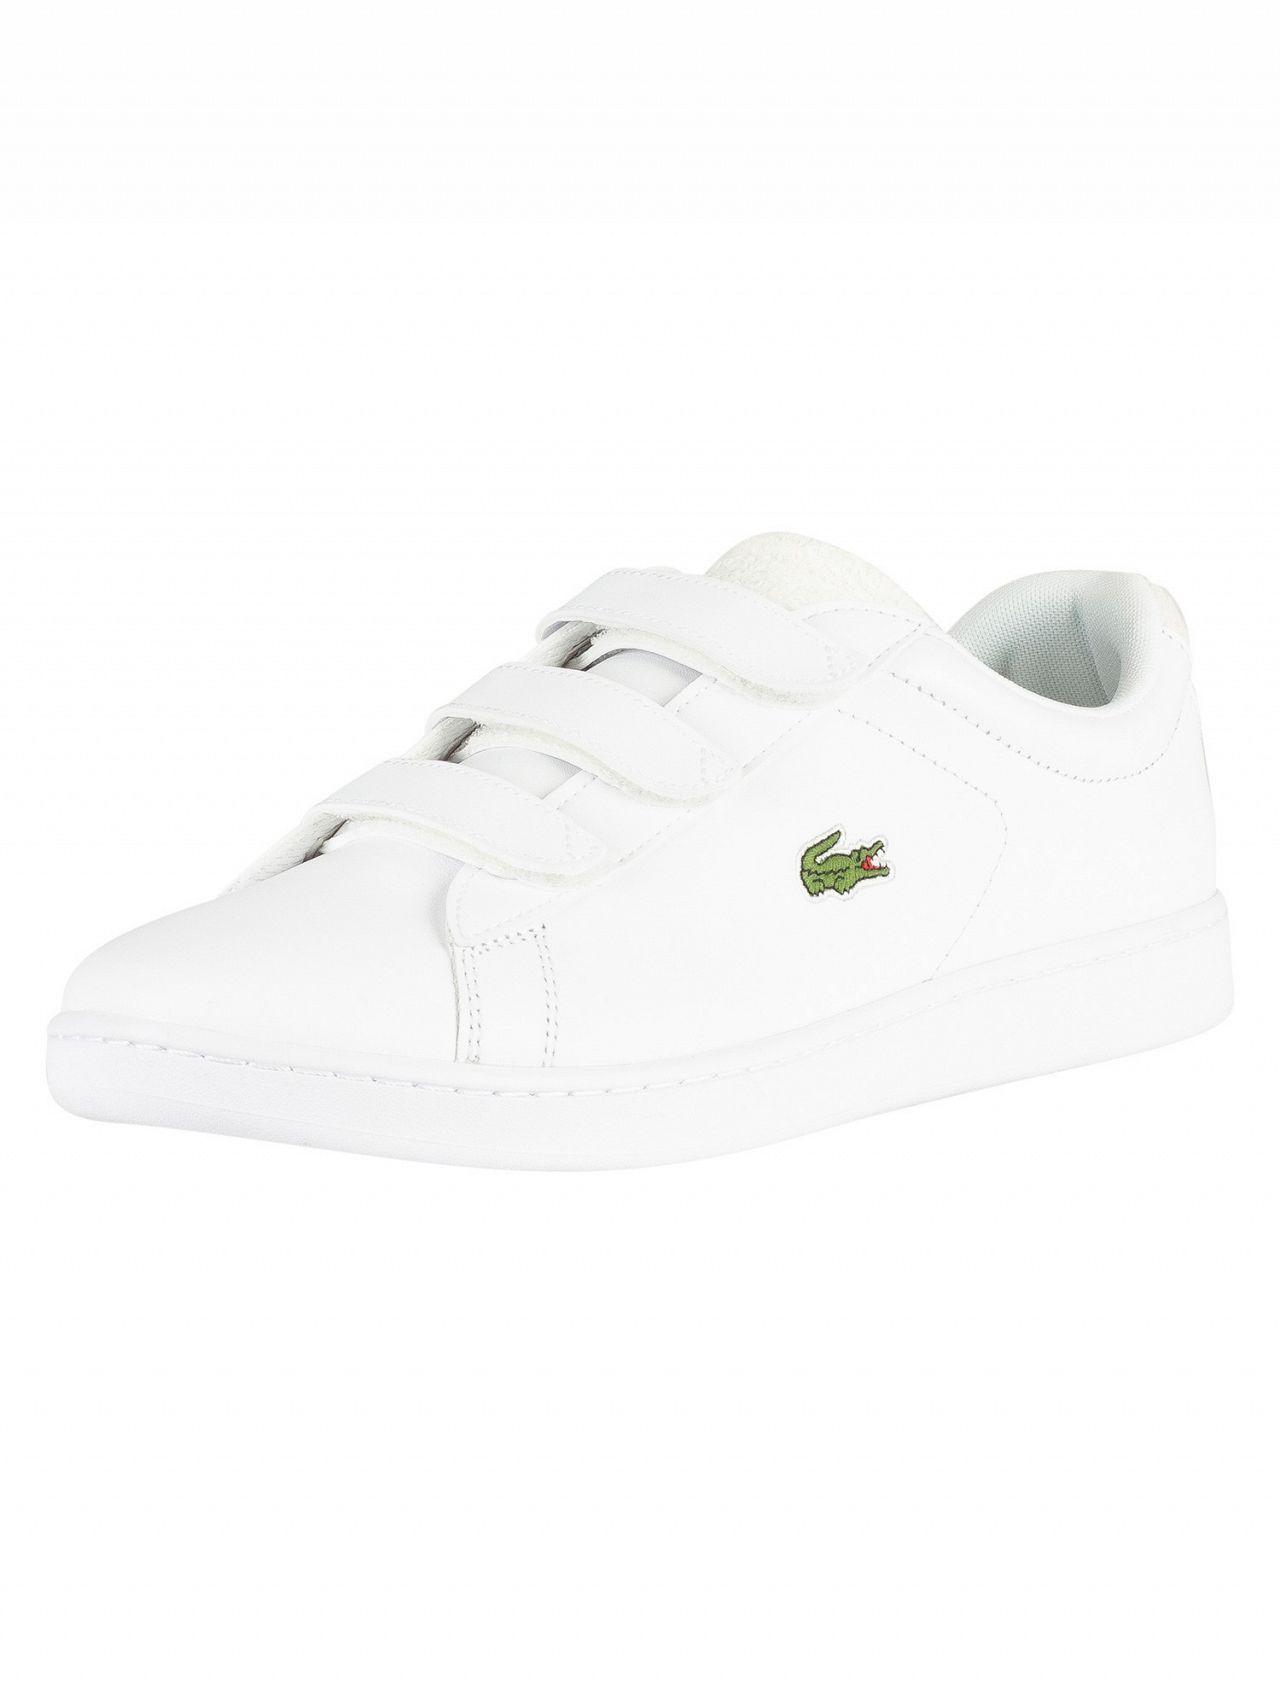 8dfa651ff1c168 Lacoste White Off White Carnaby Evo Strap 119 3 SMA Leather Trainers ...